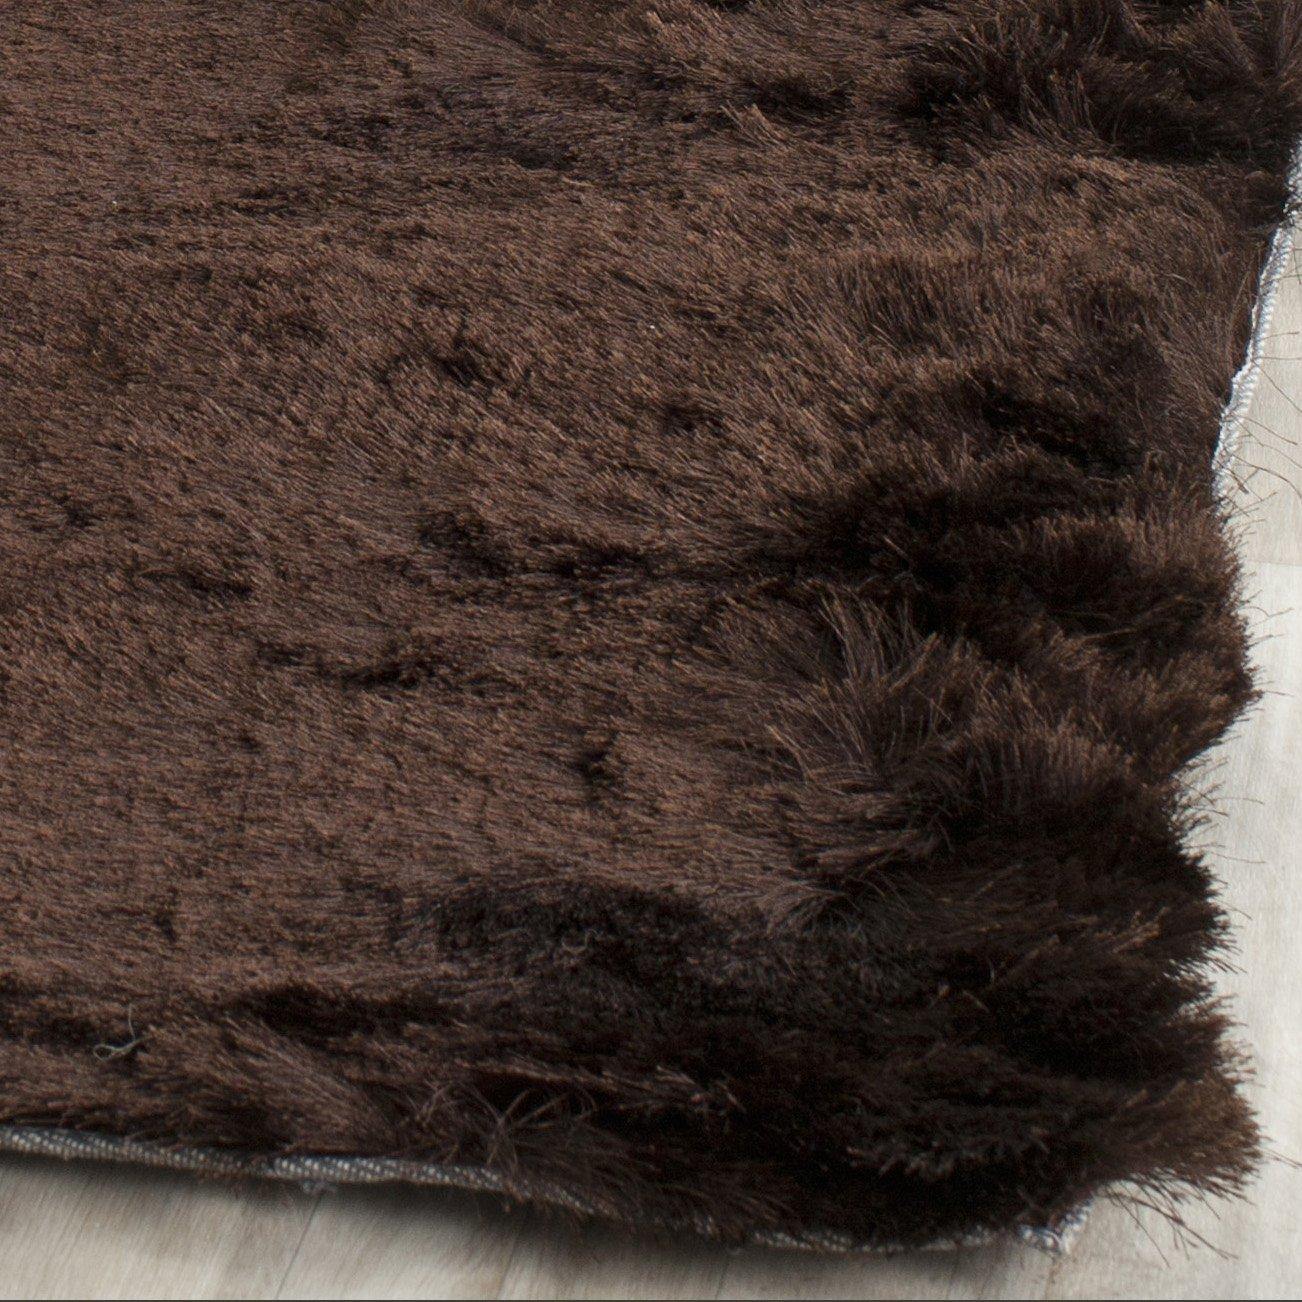 amazoncom safavieh paris shag collection sg5112727 chocolate polyester area rug 2u0027 x 3u0027 kitchen u0026 dining